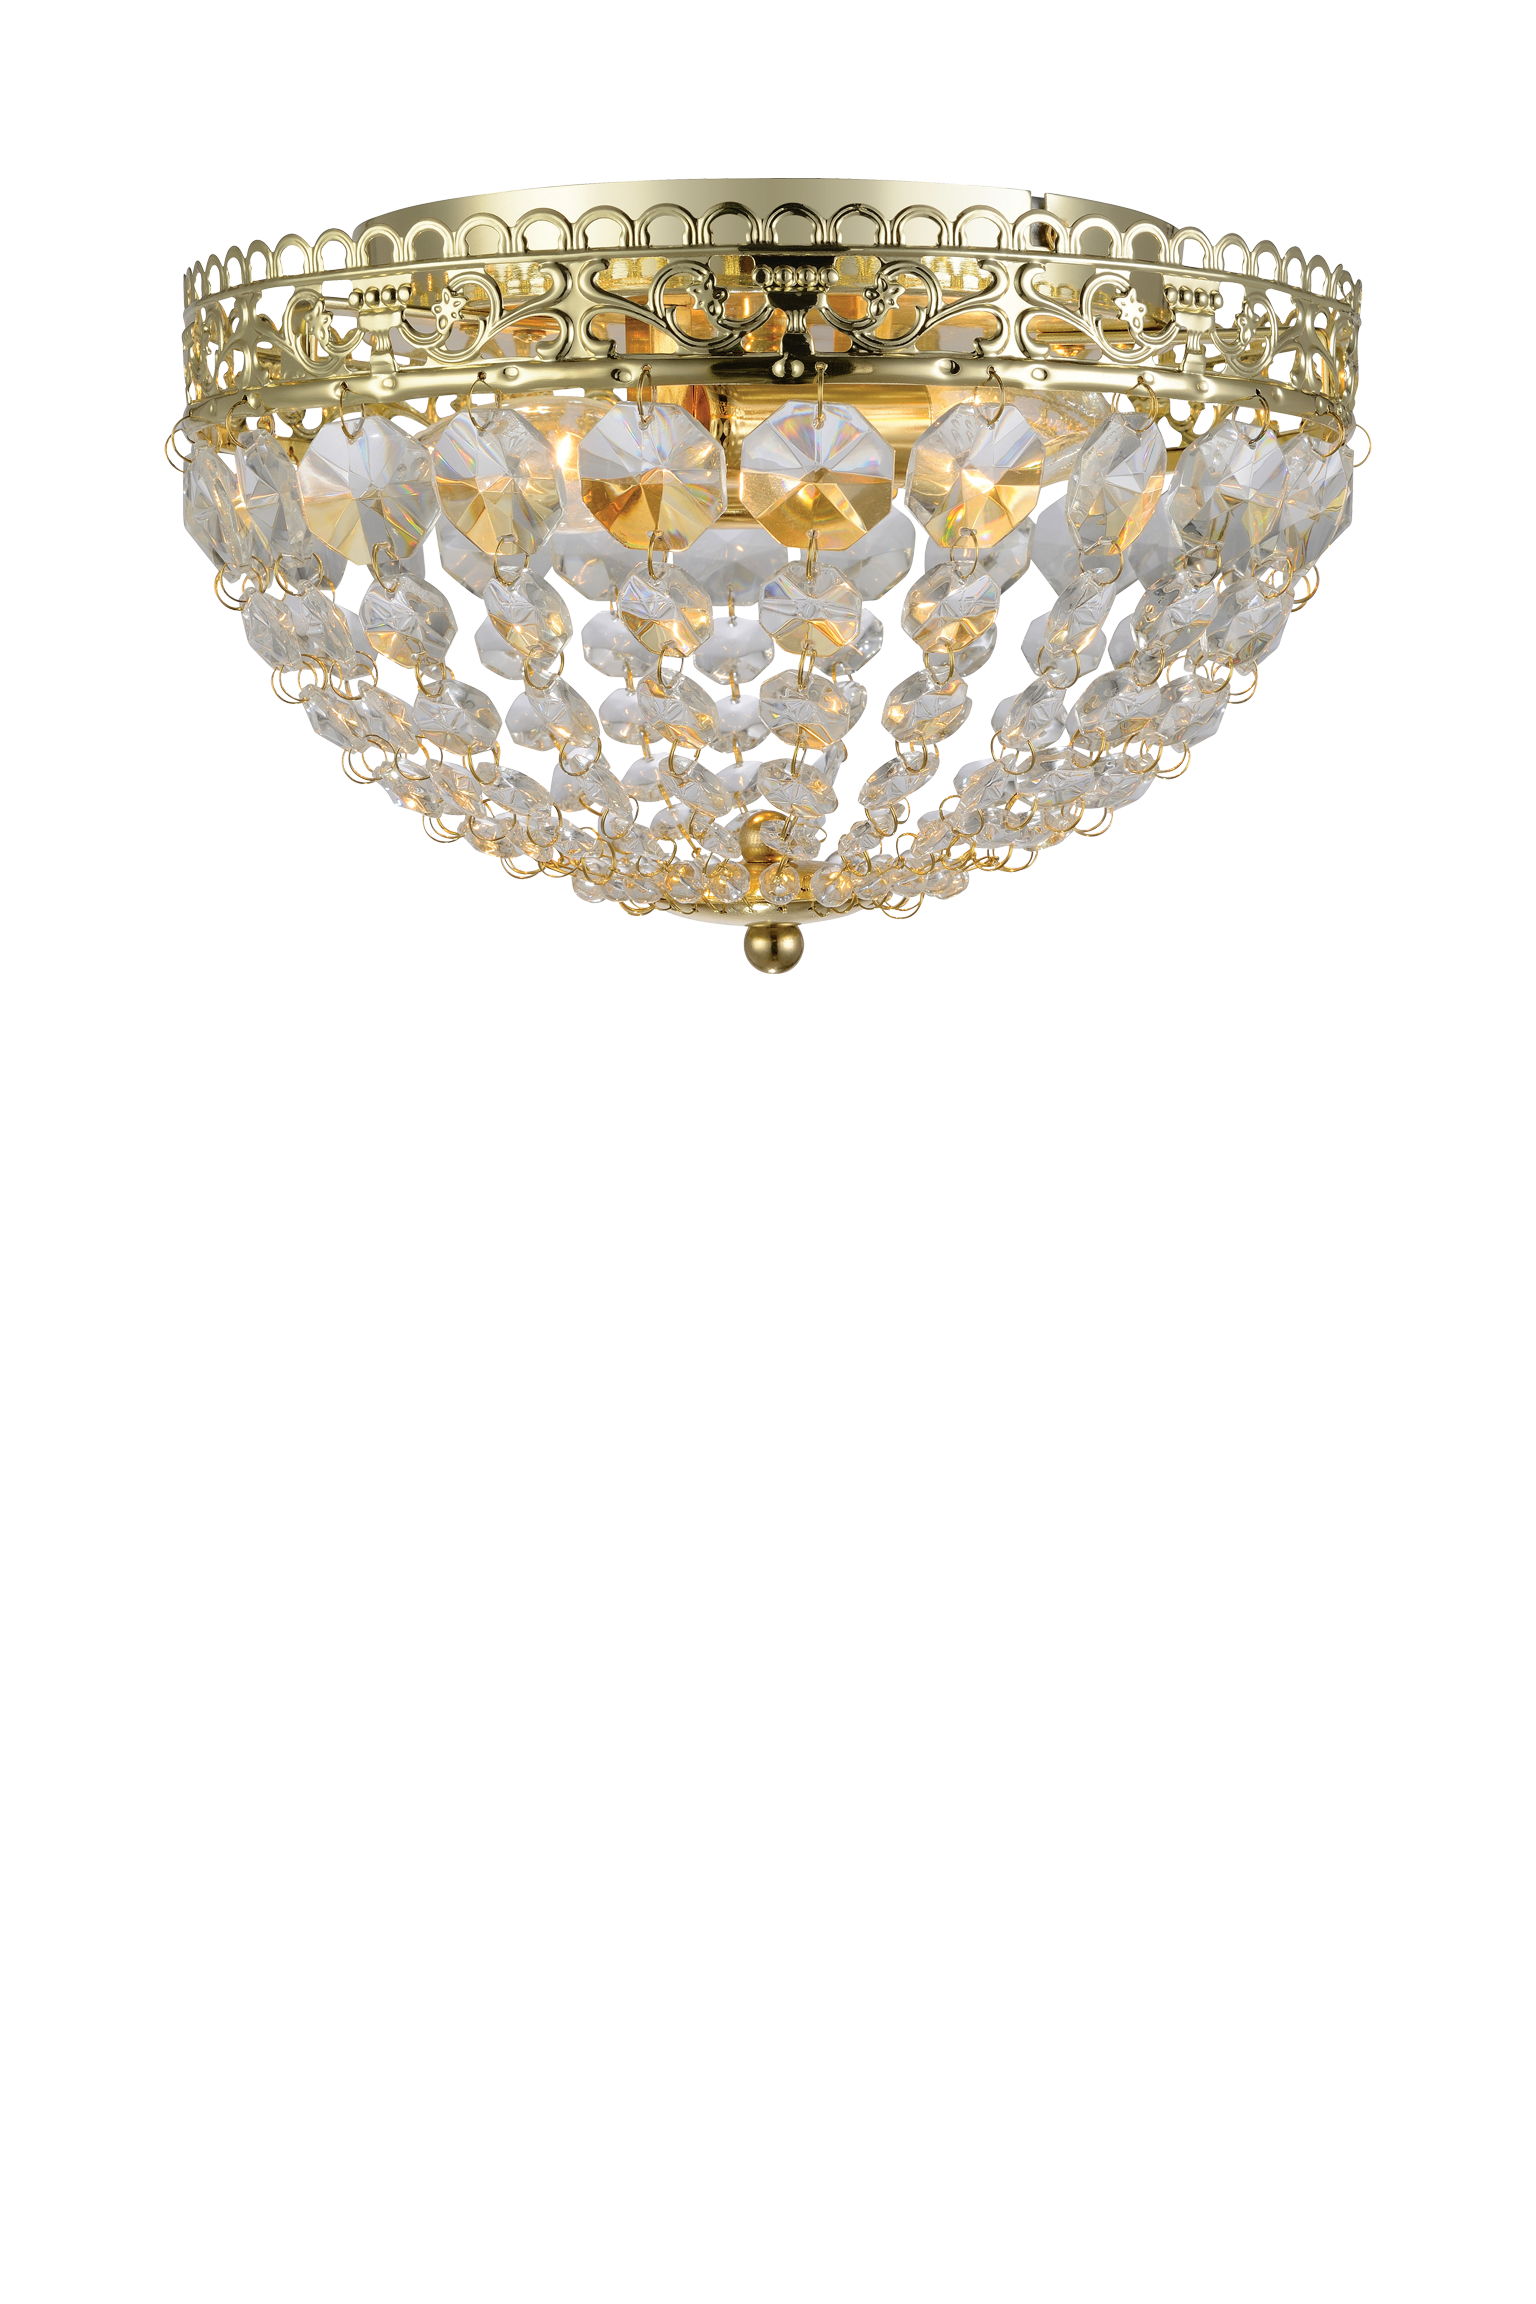 SAXHOLM - Plafond Gold